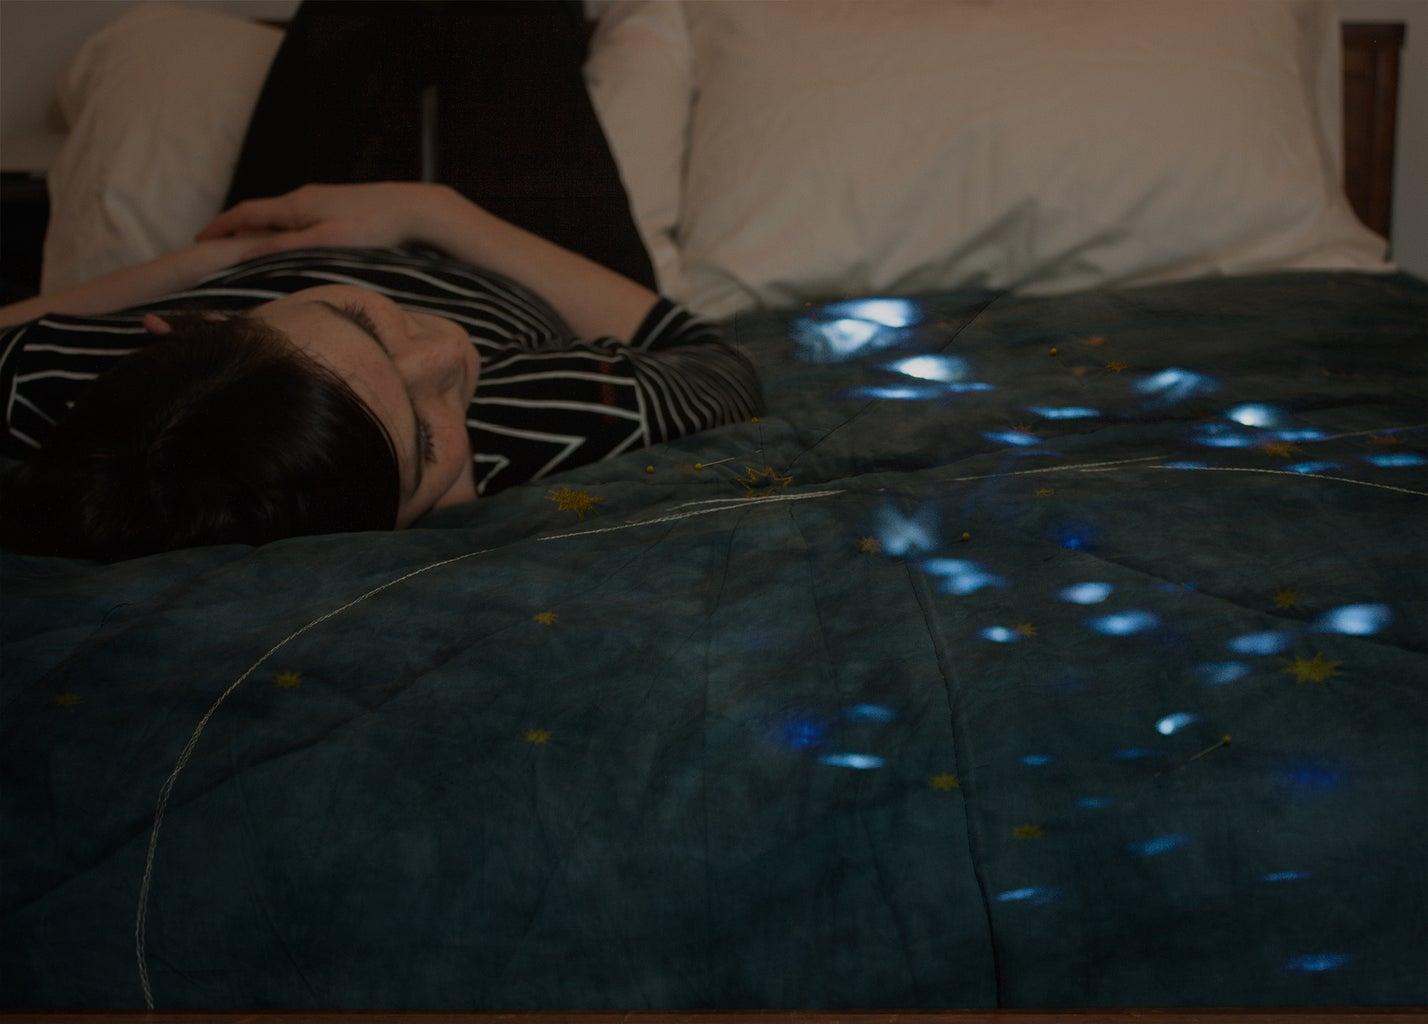 Indigo Starlight Quilt - LED Hand-dyed Constellation Quilt